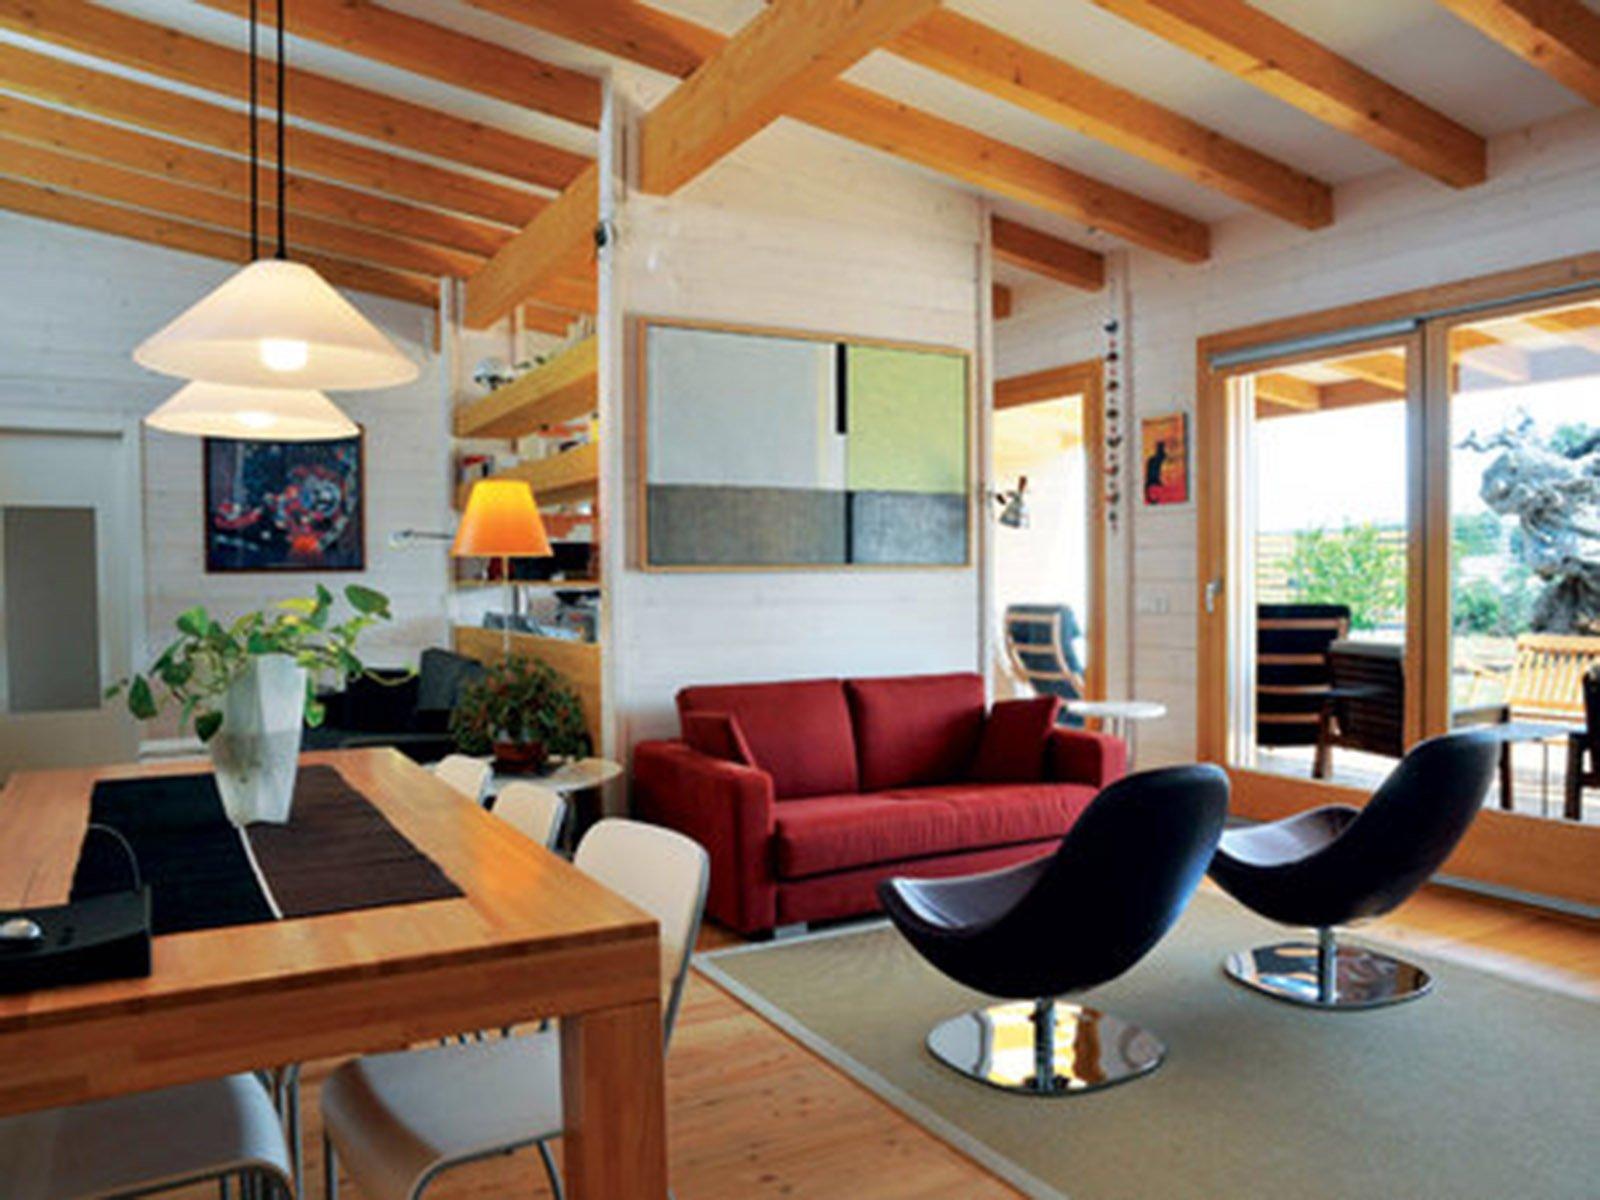 Bioarchitettura e case ecologiche prefabbricate in legno cose di casa - Interni case in legno ...